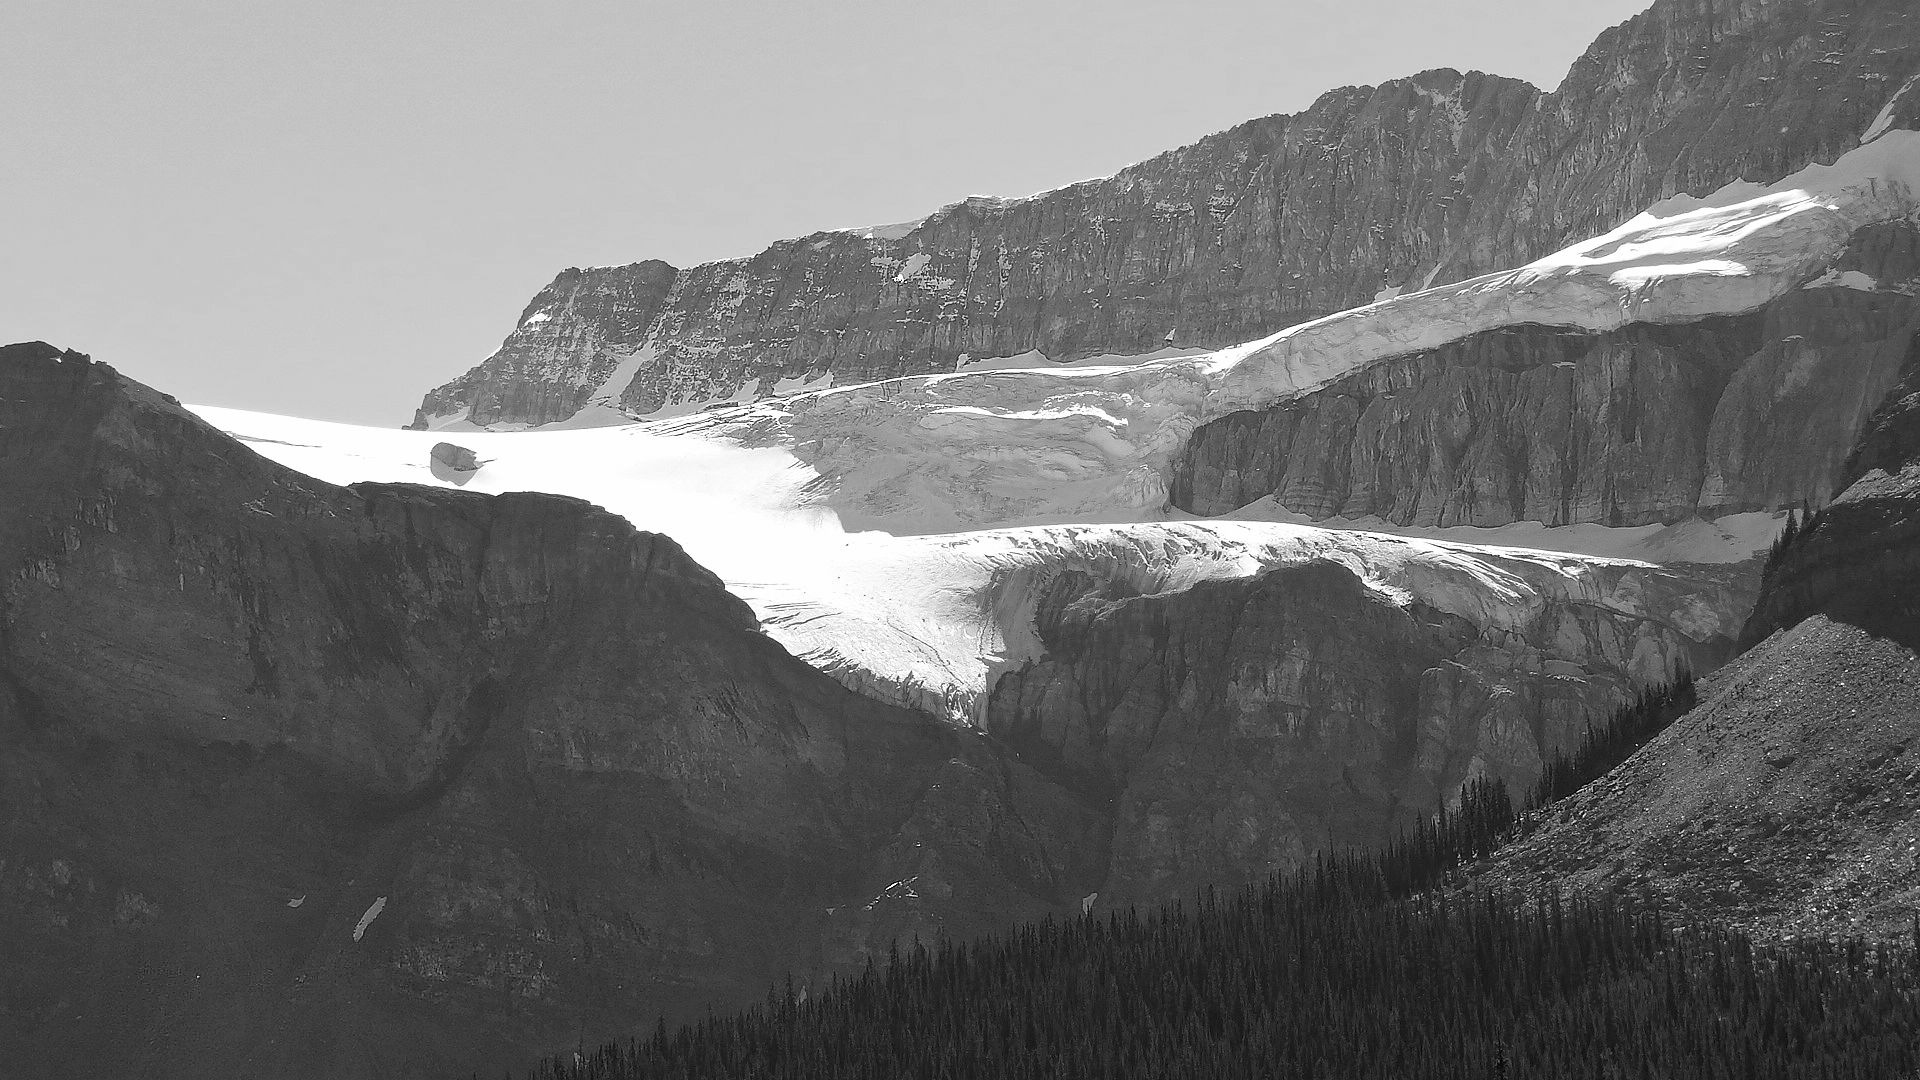 Crowfoot Glacier by tricialpat